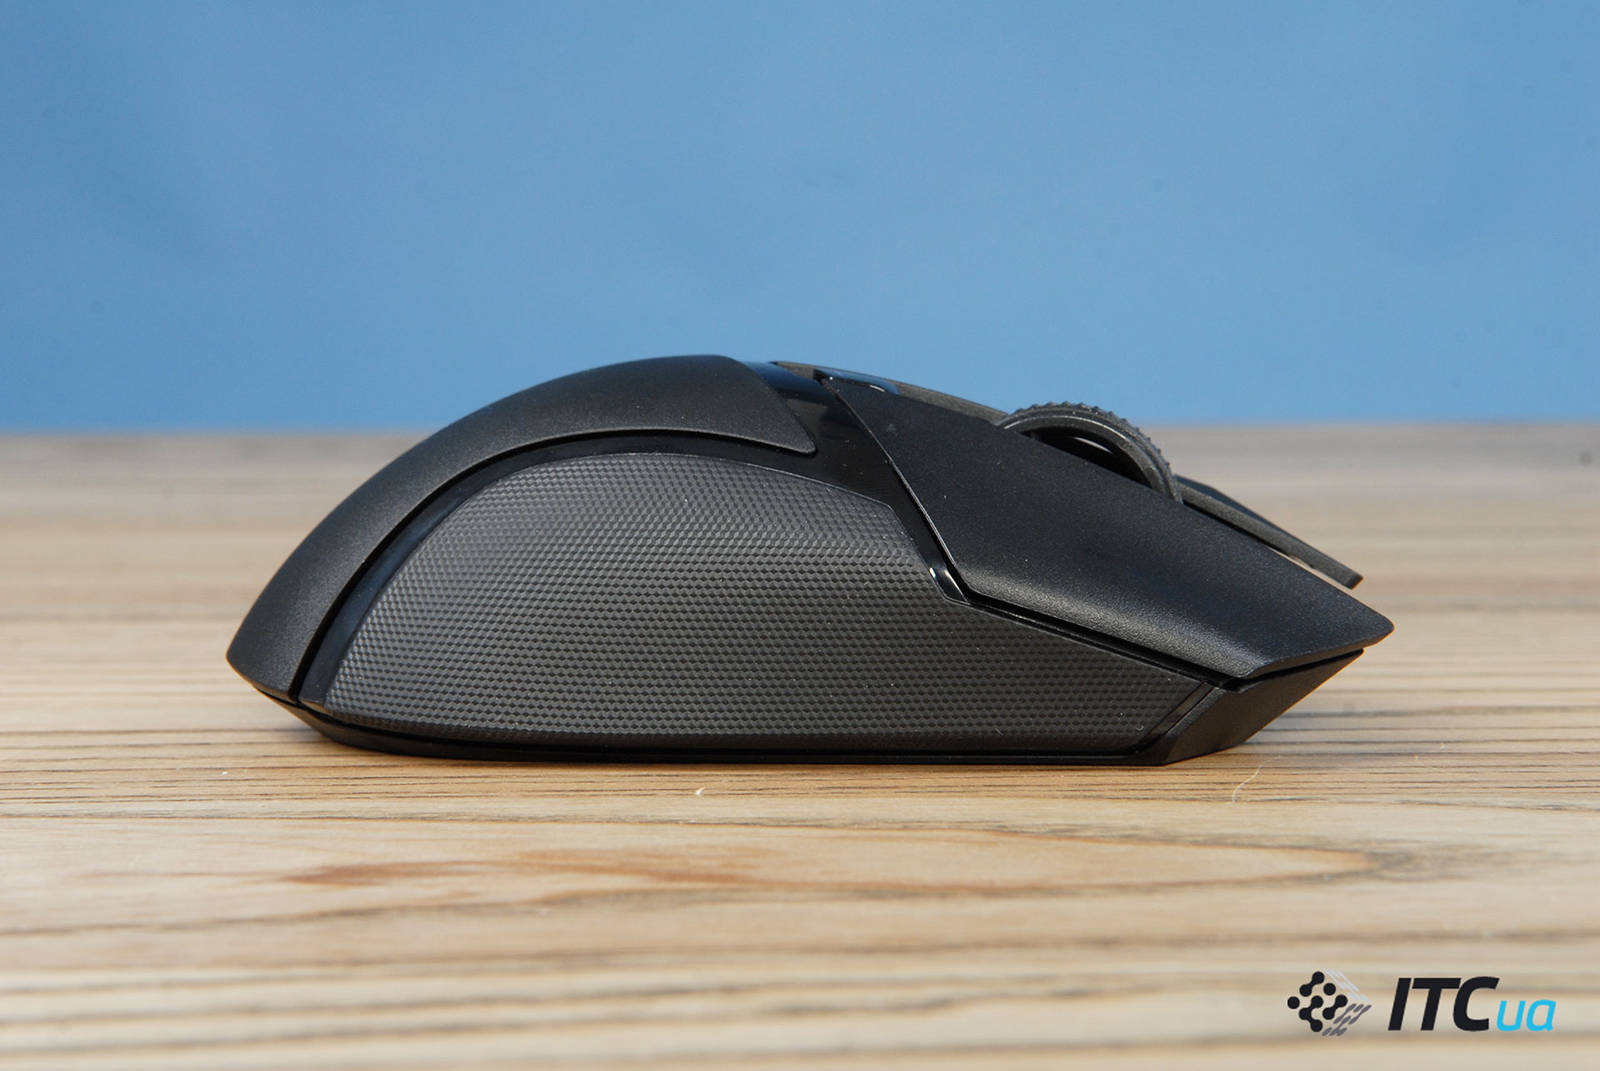 Мышка Razer Basilisk X HyperSpeed. Фото 9